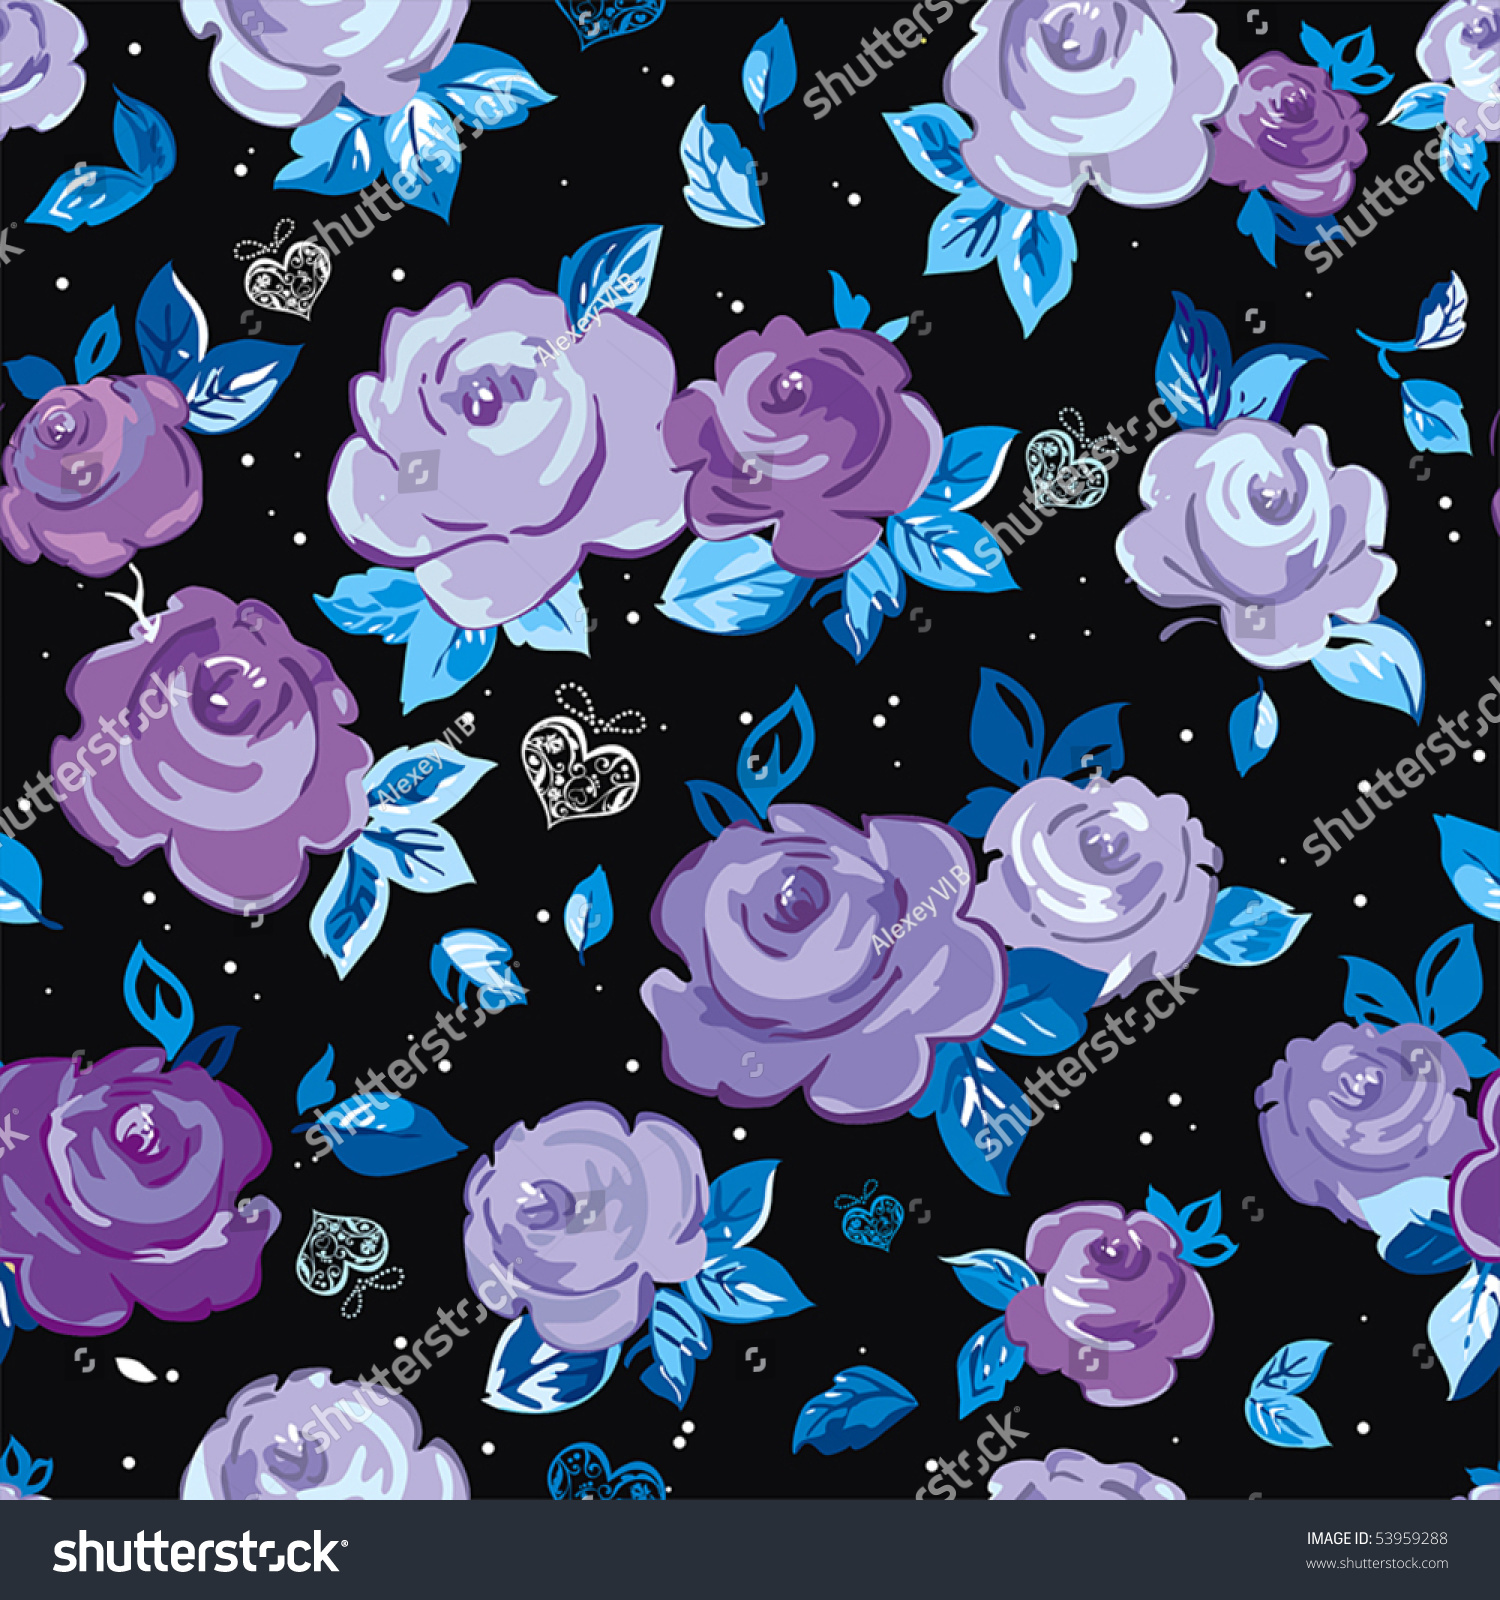 Elegance Seamless wallpaper pattern with of violet roses on black background, vector illustration